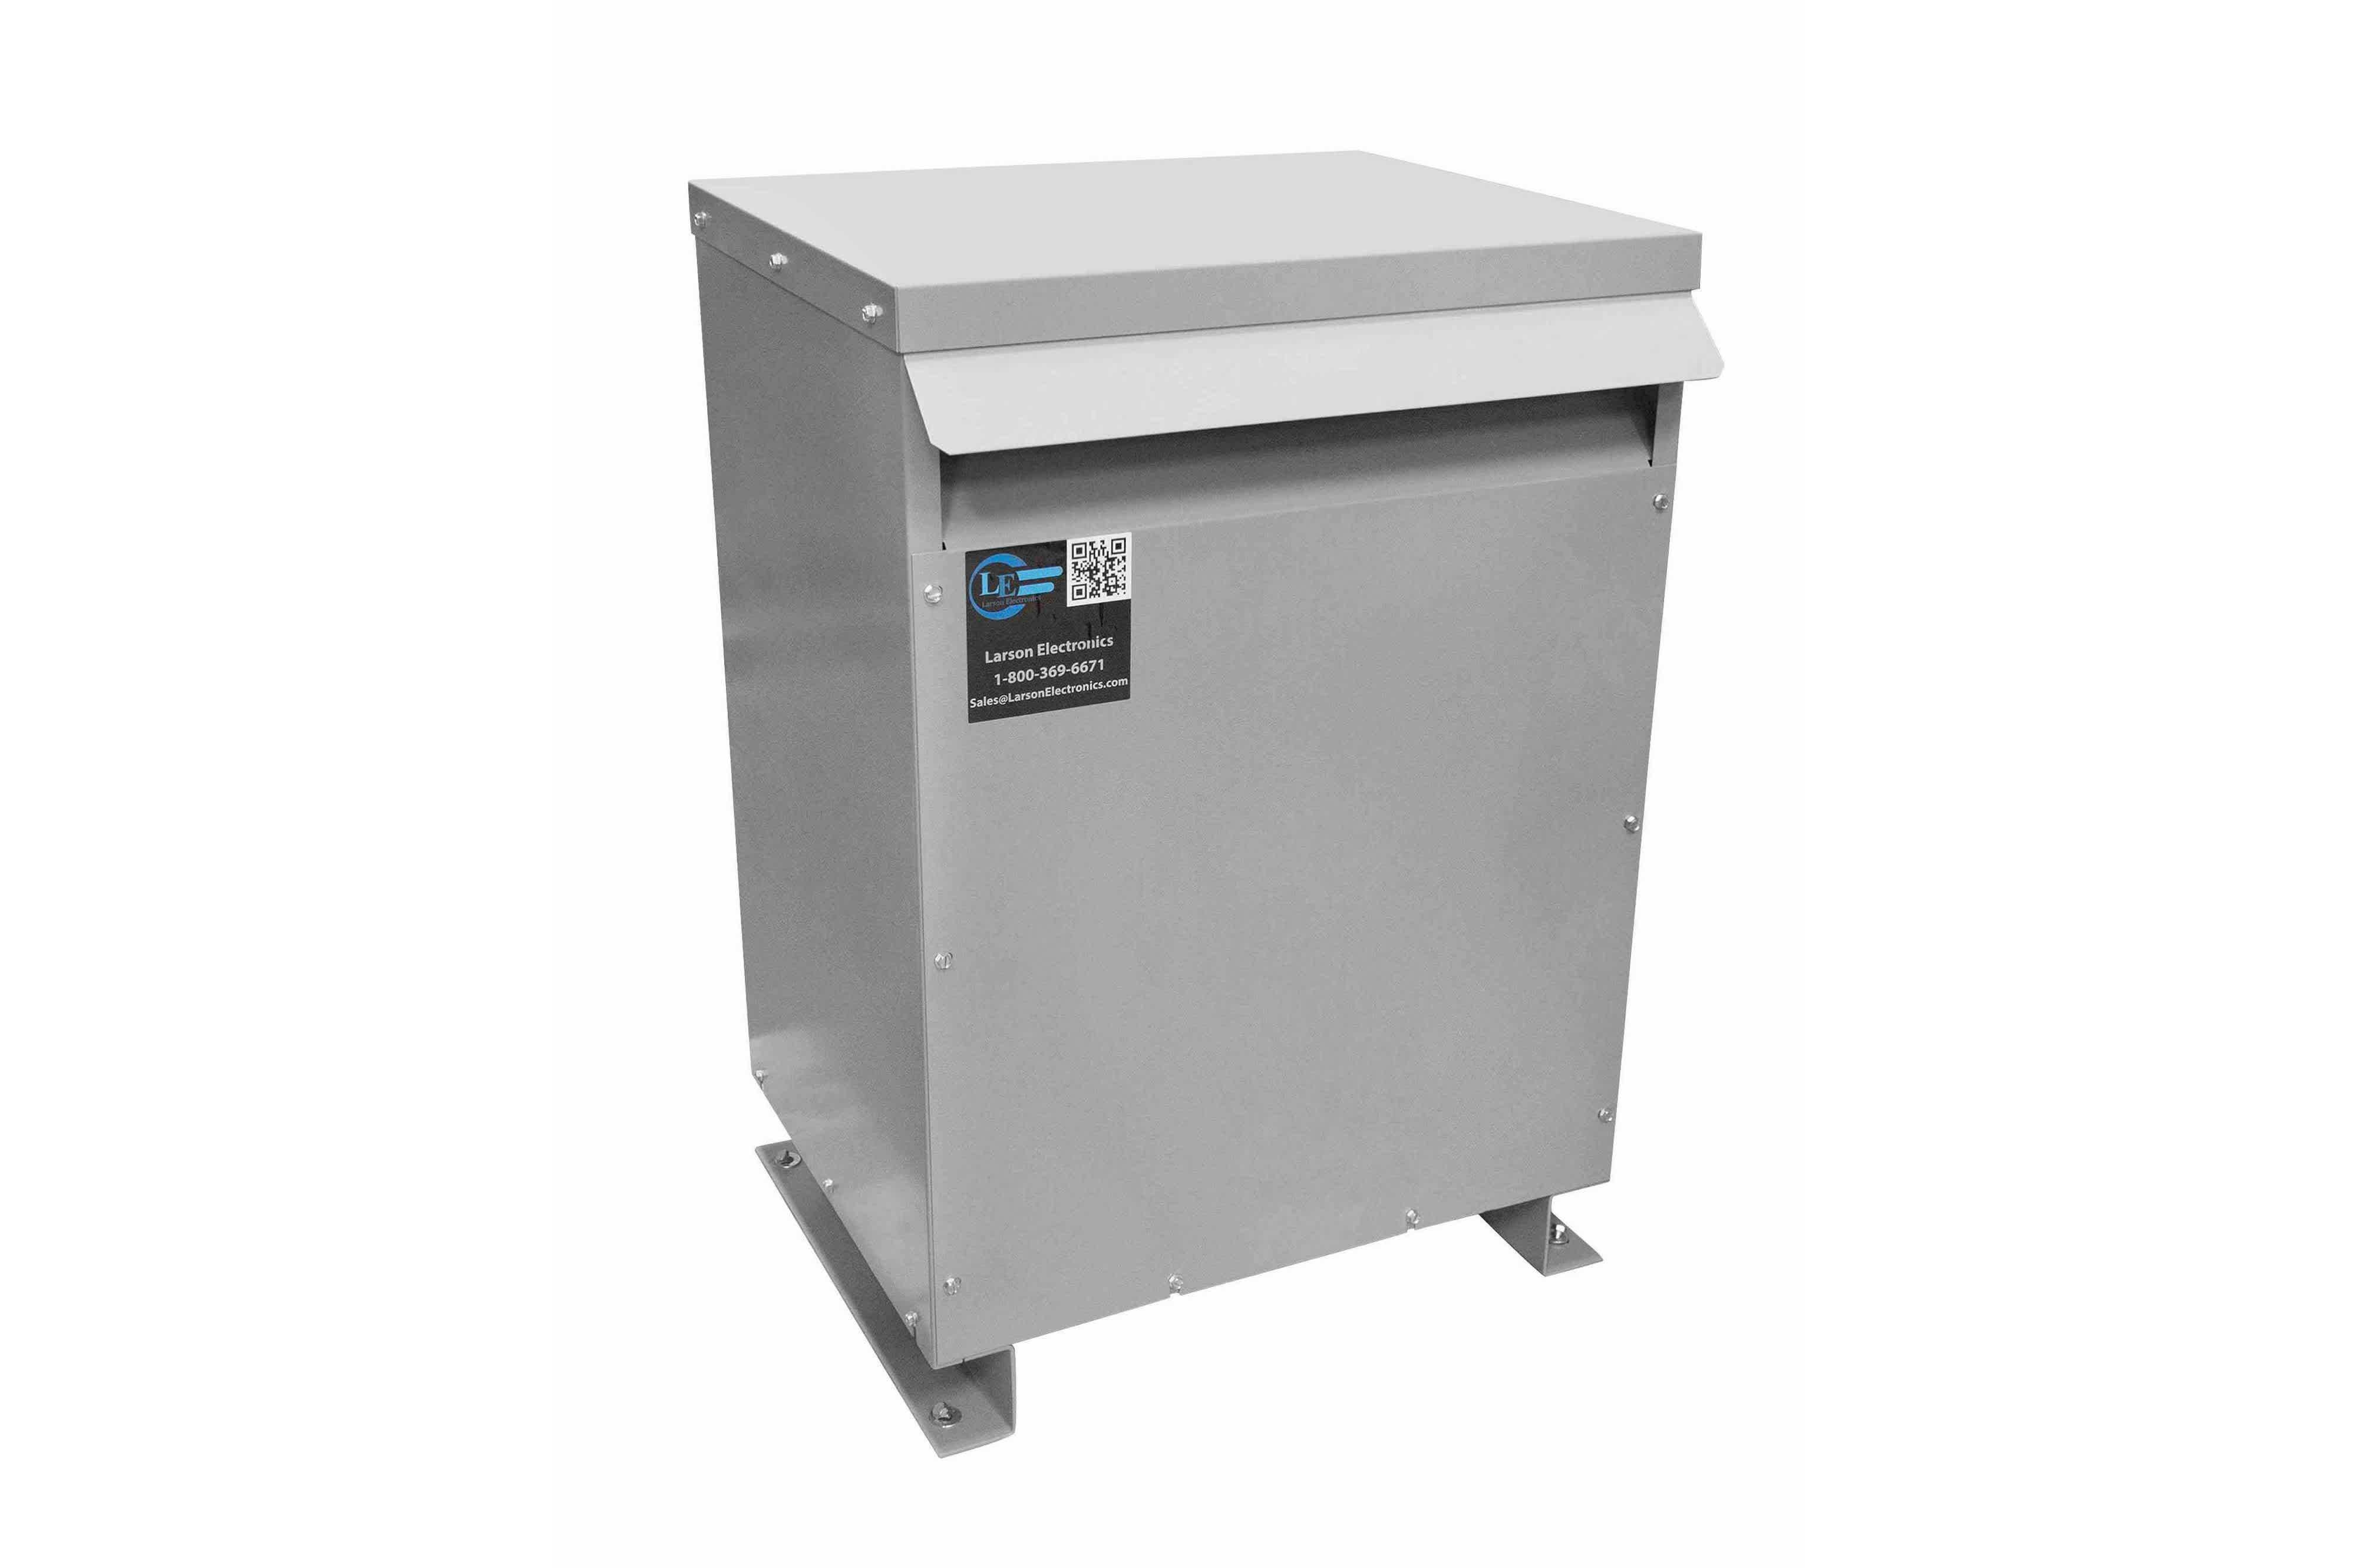 112.5 kVA 3PH Isolation Transformer, 600V Wye Primary, 415V Delta Secondary, N3R, Ventilated, 60 Hz